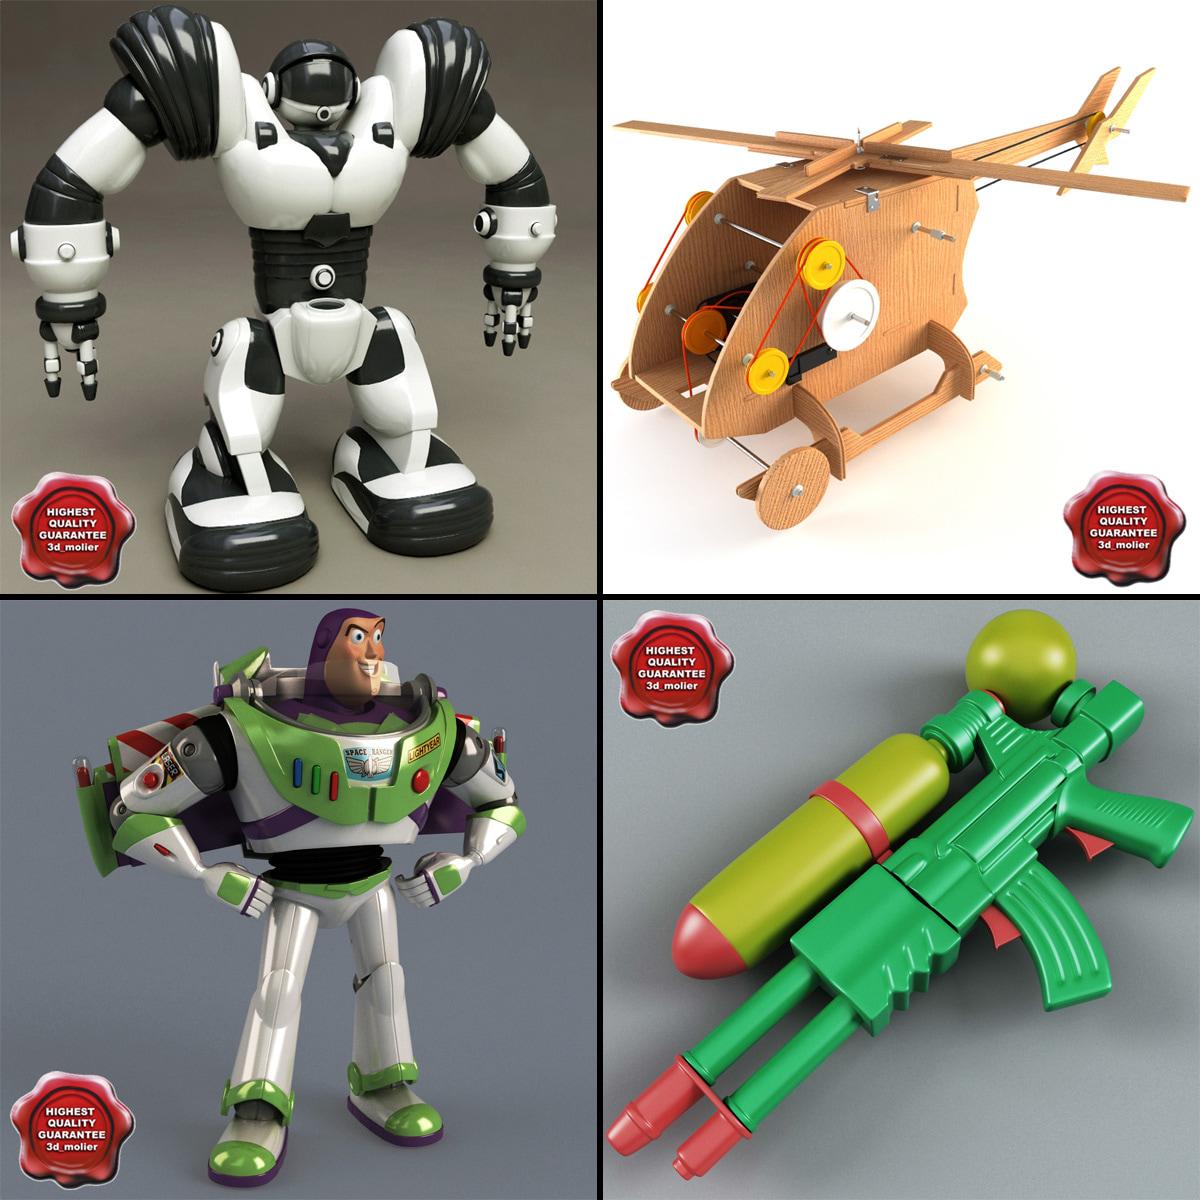 Toys_Collection_V3_000.jpg